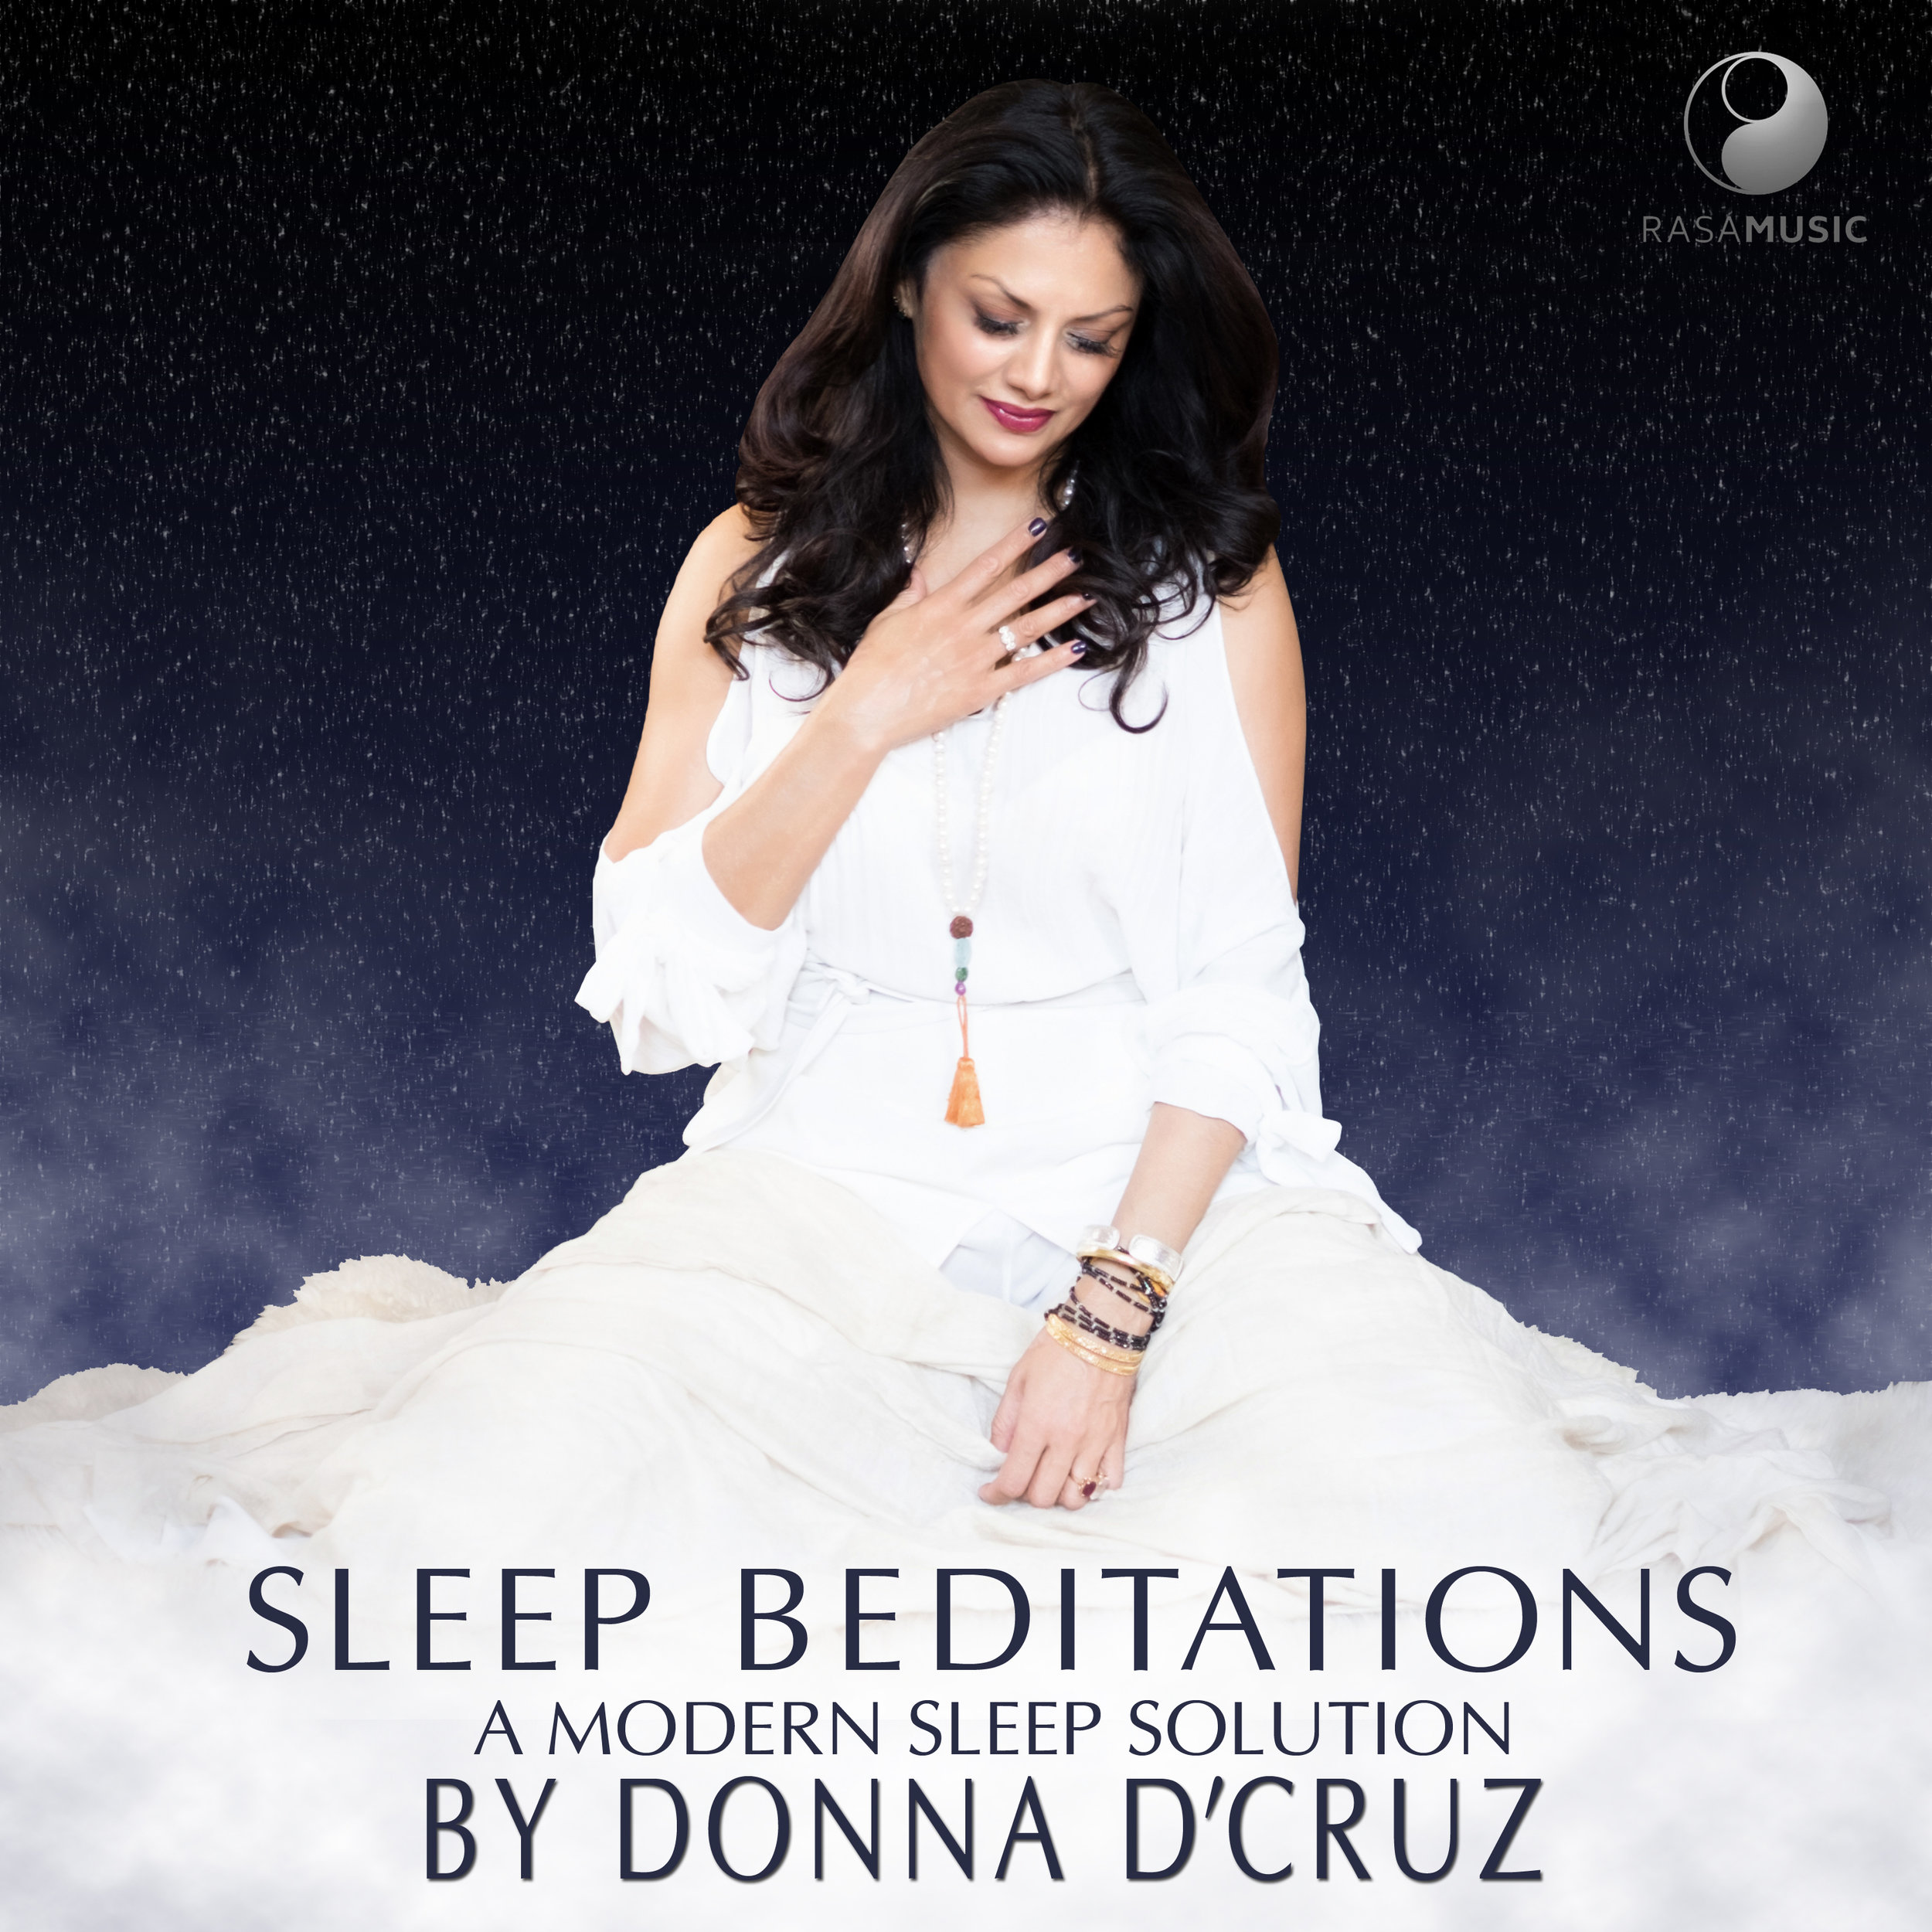 Sleep Beditations A Modern Sleep Solution.JPG